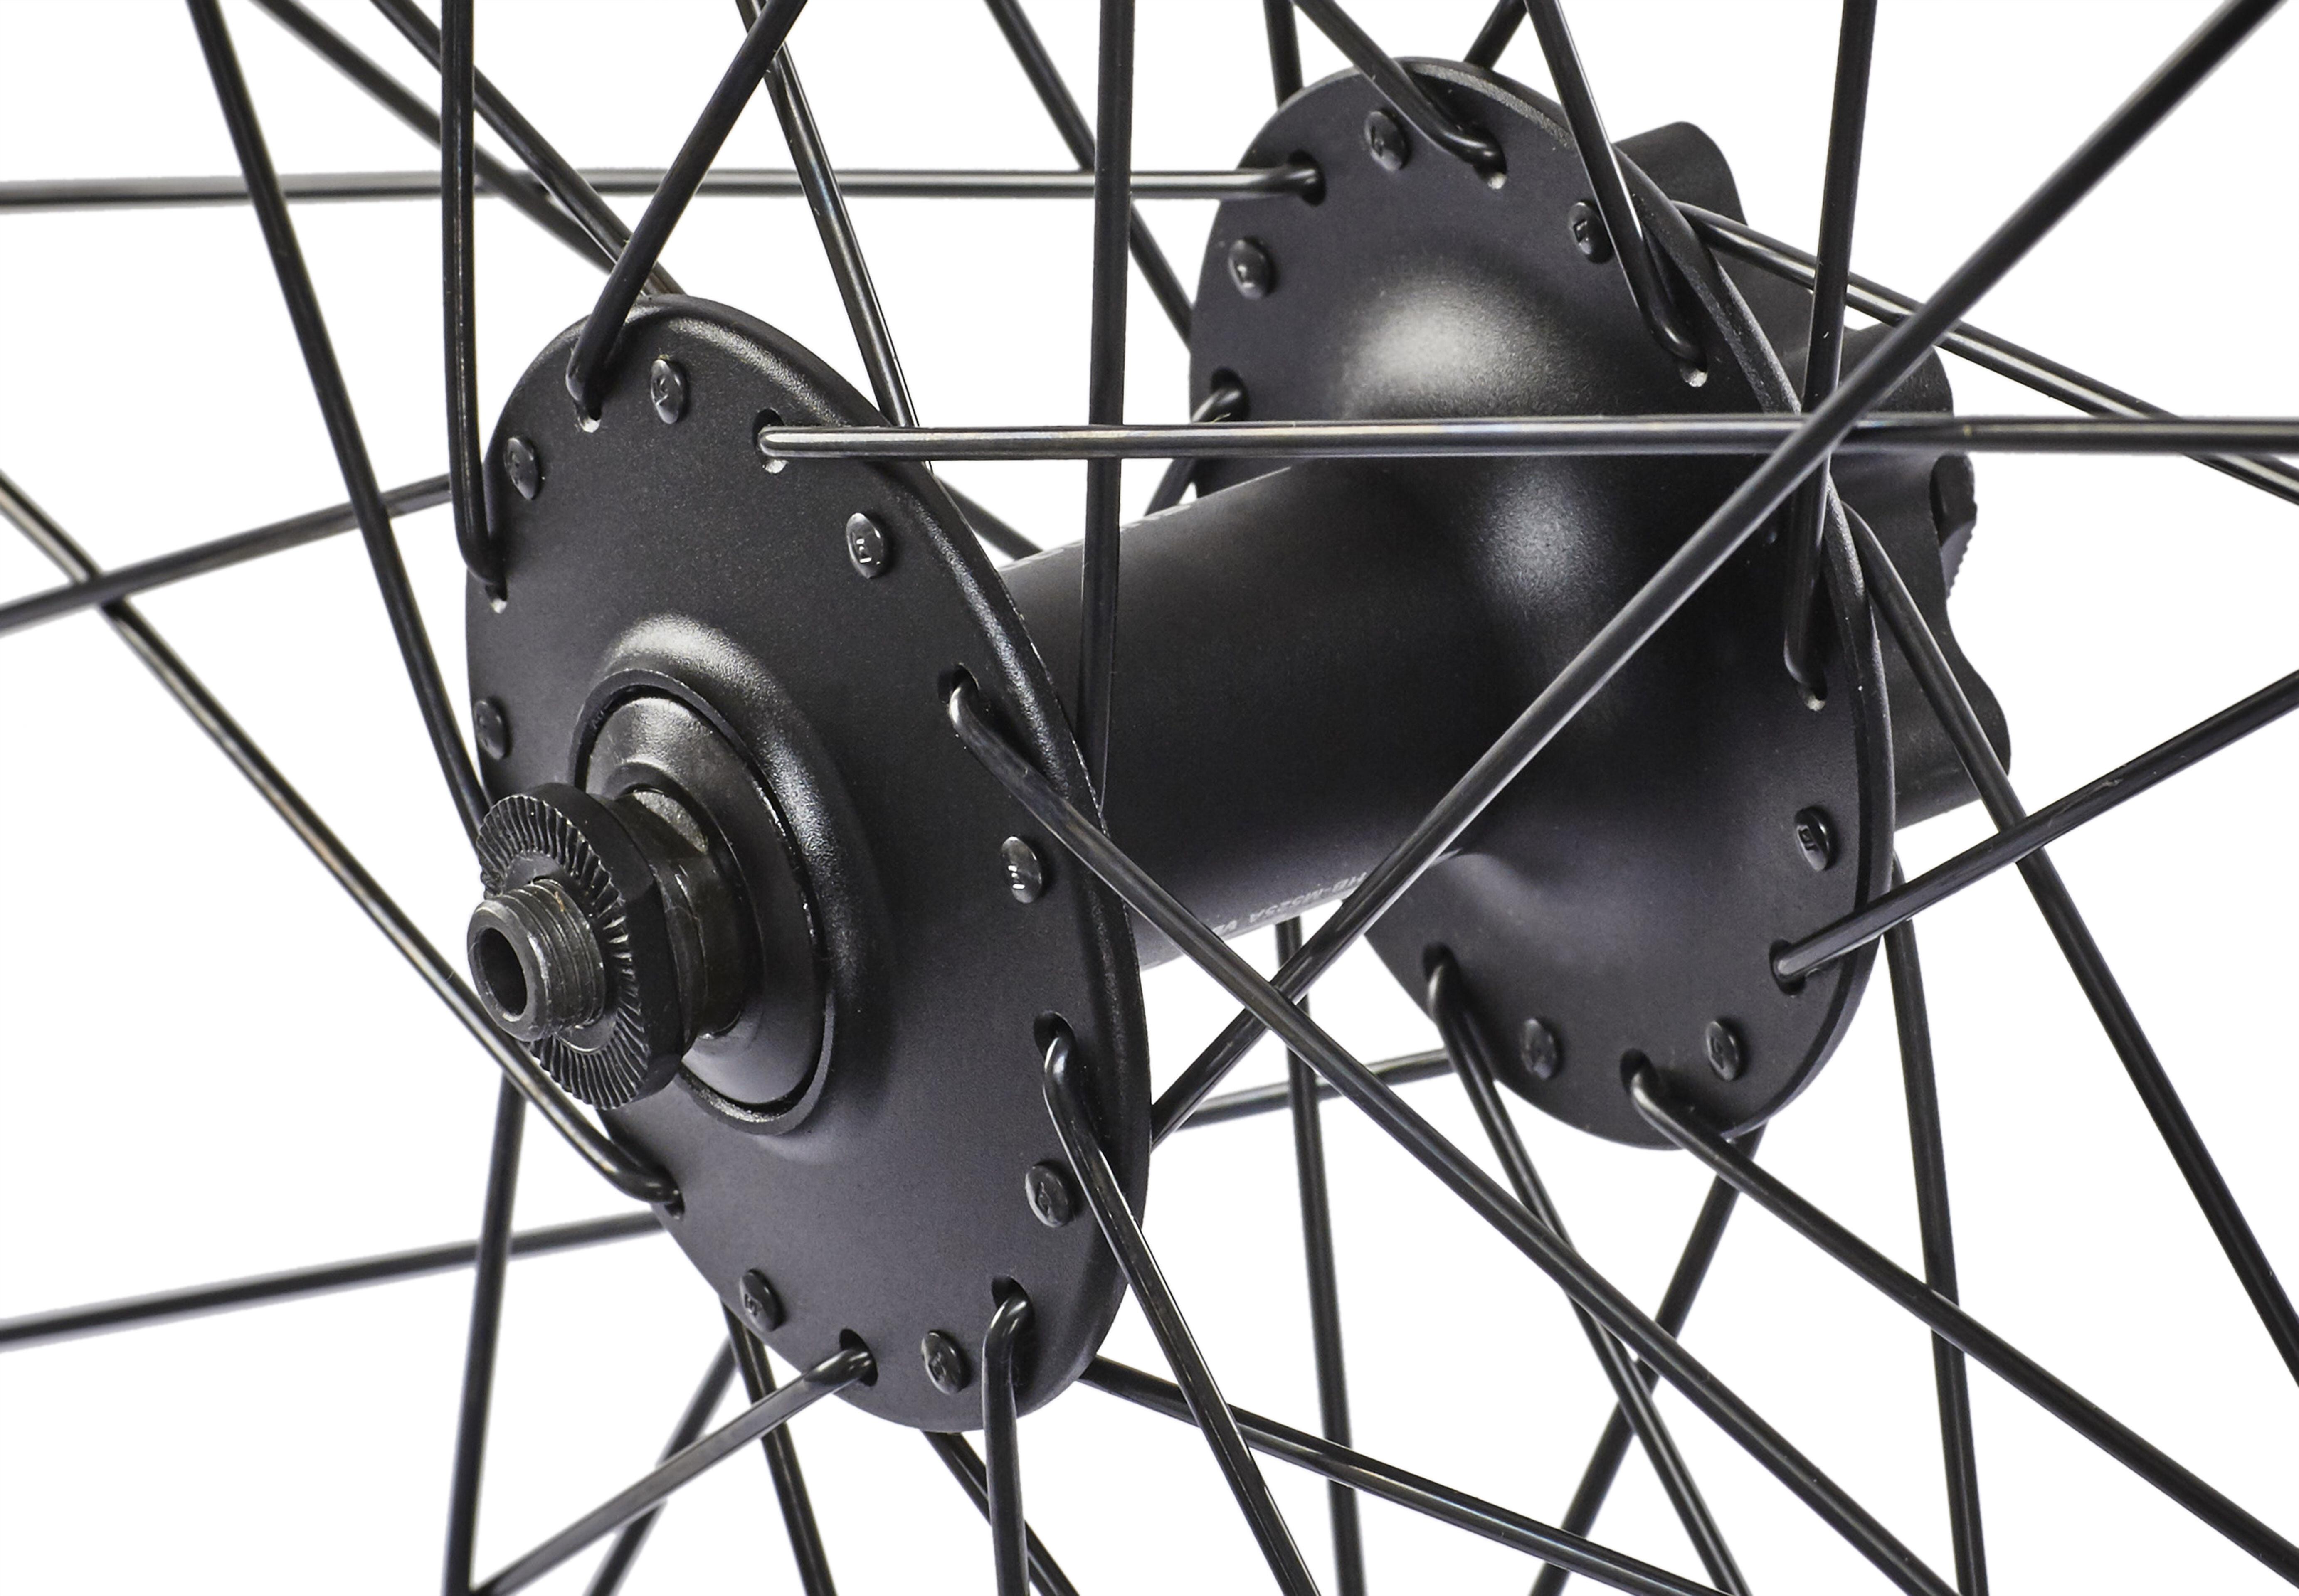 ryde v hjul zac 2000 deore disc 28 tum gr svart till fenomenalt pris p bikester. Black Bedroom Furniture Sets. Home Design Ideas